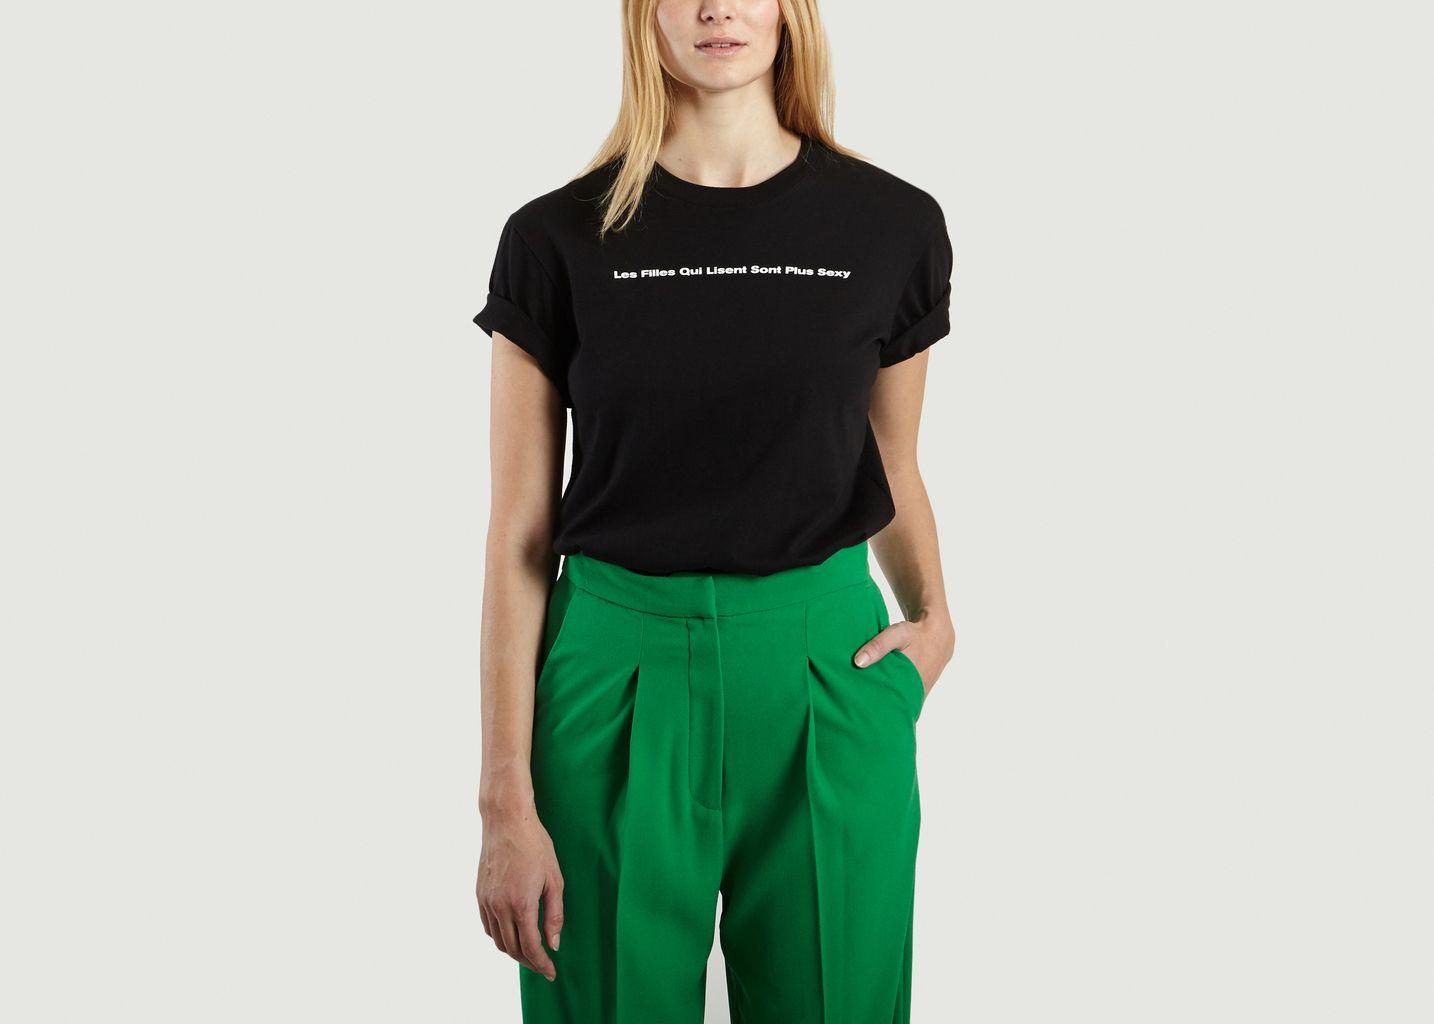 jc de castelbajac t shirt femme 2014 mexicain